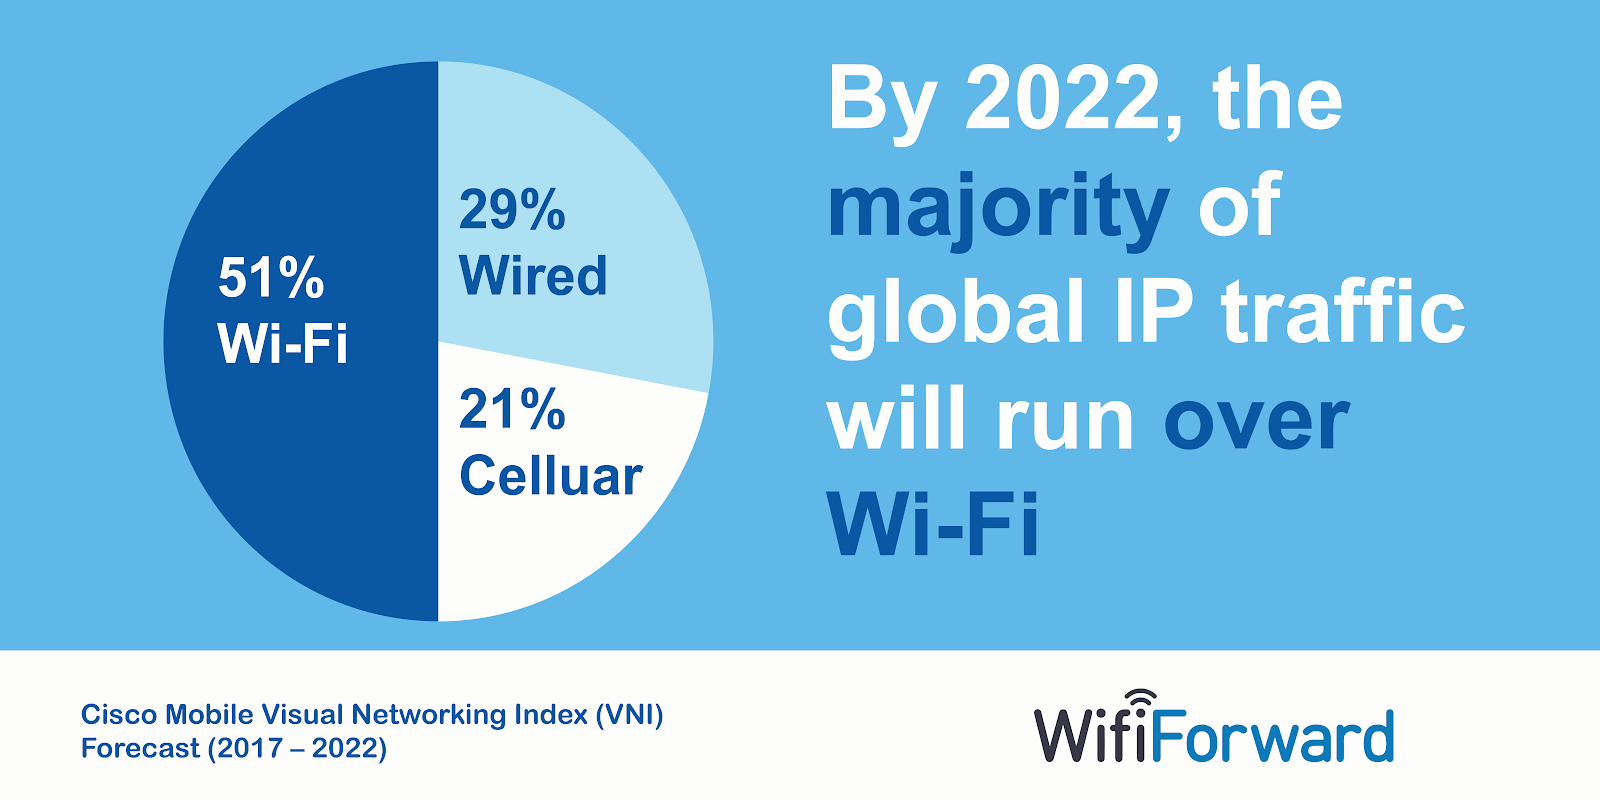 Cisco's Mobile VNI Report: Wi-Fi Use Will Skyrocket - WifiForward